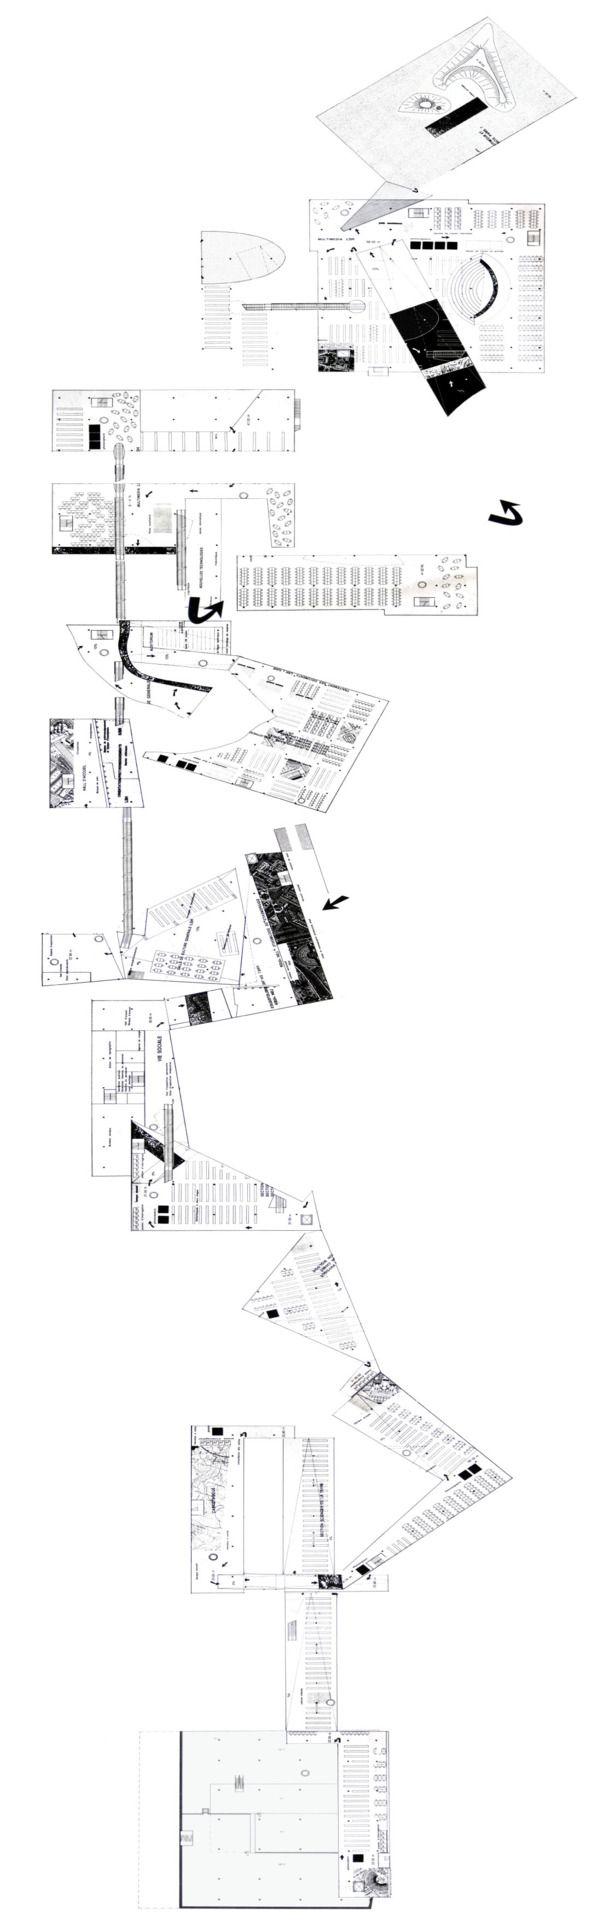 Ref Proyectos y PFC. www.worksdifferent.com OMA (1997)